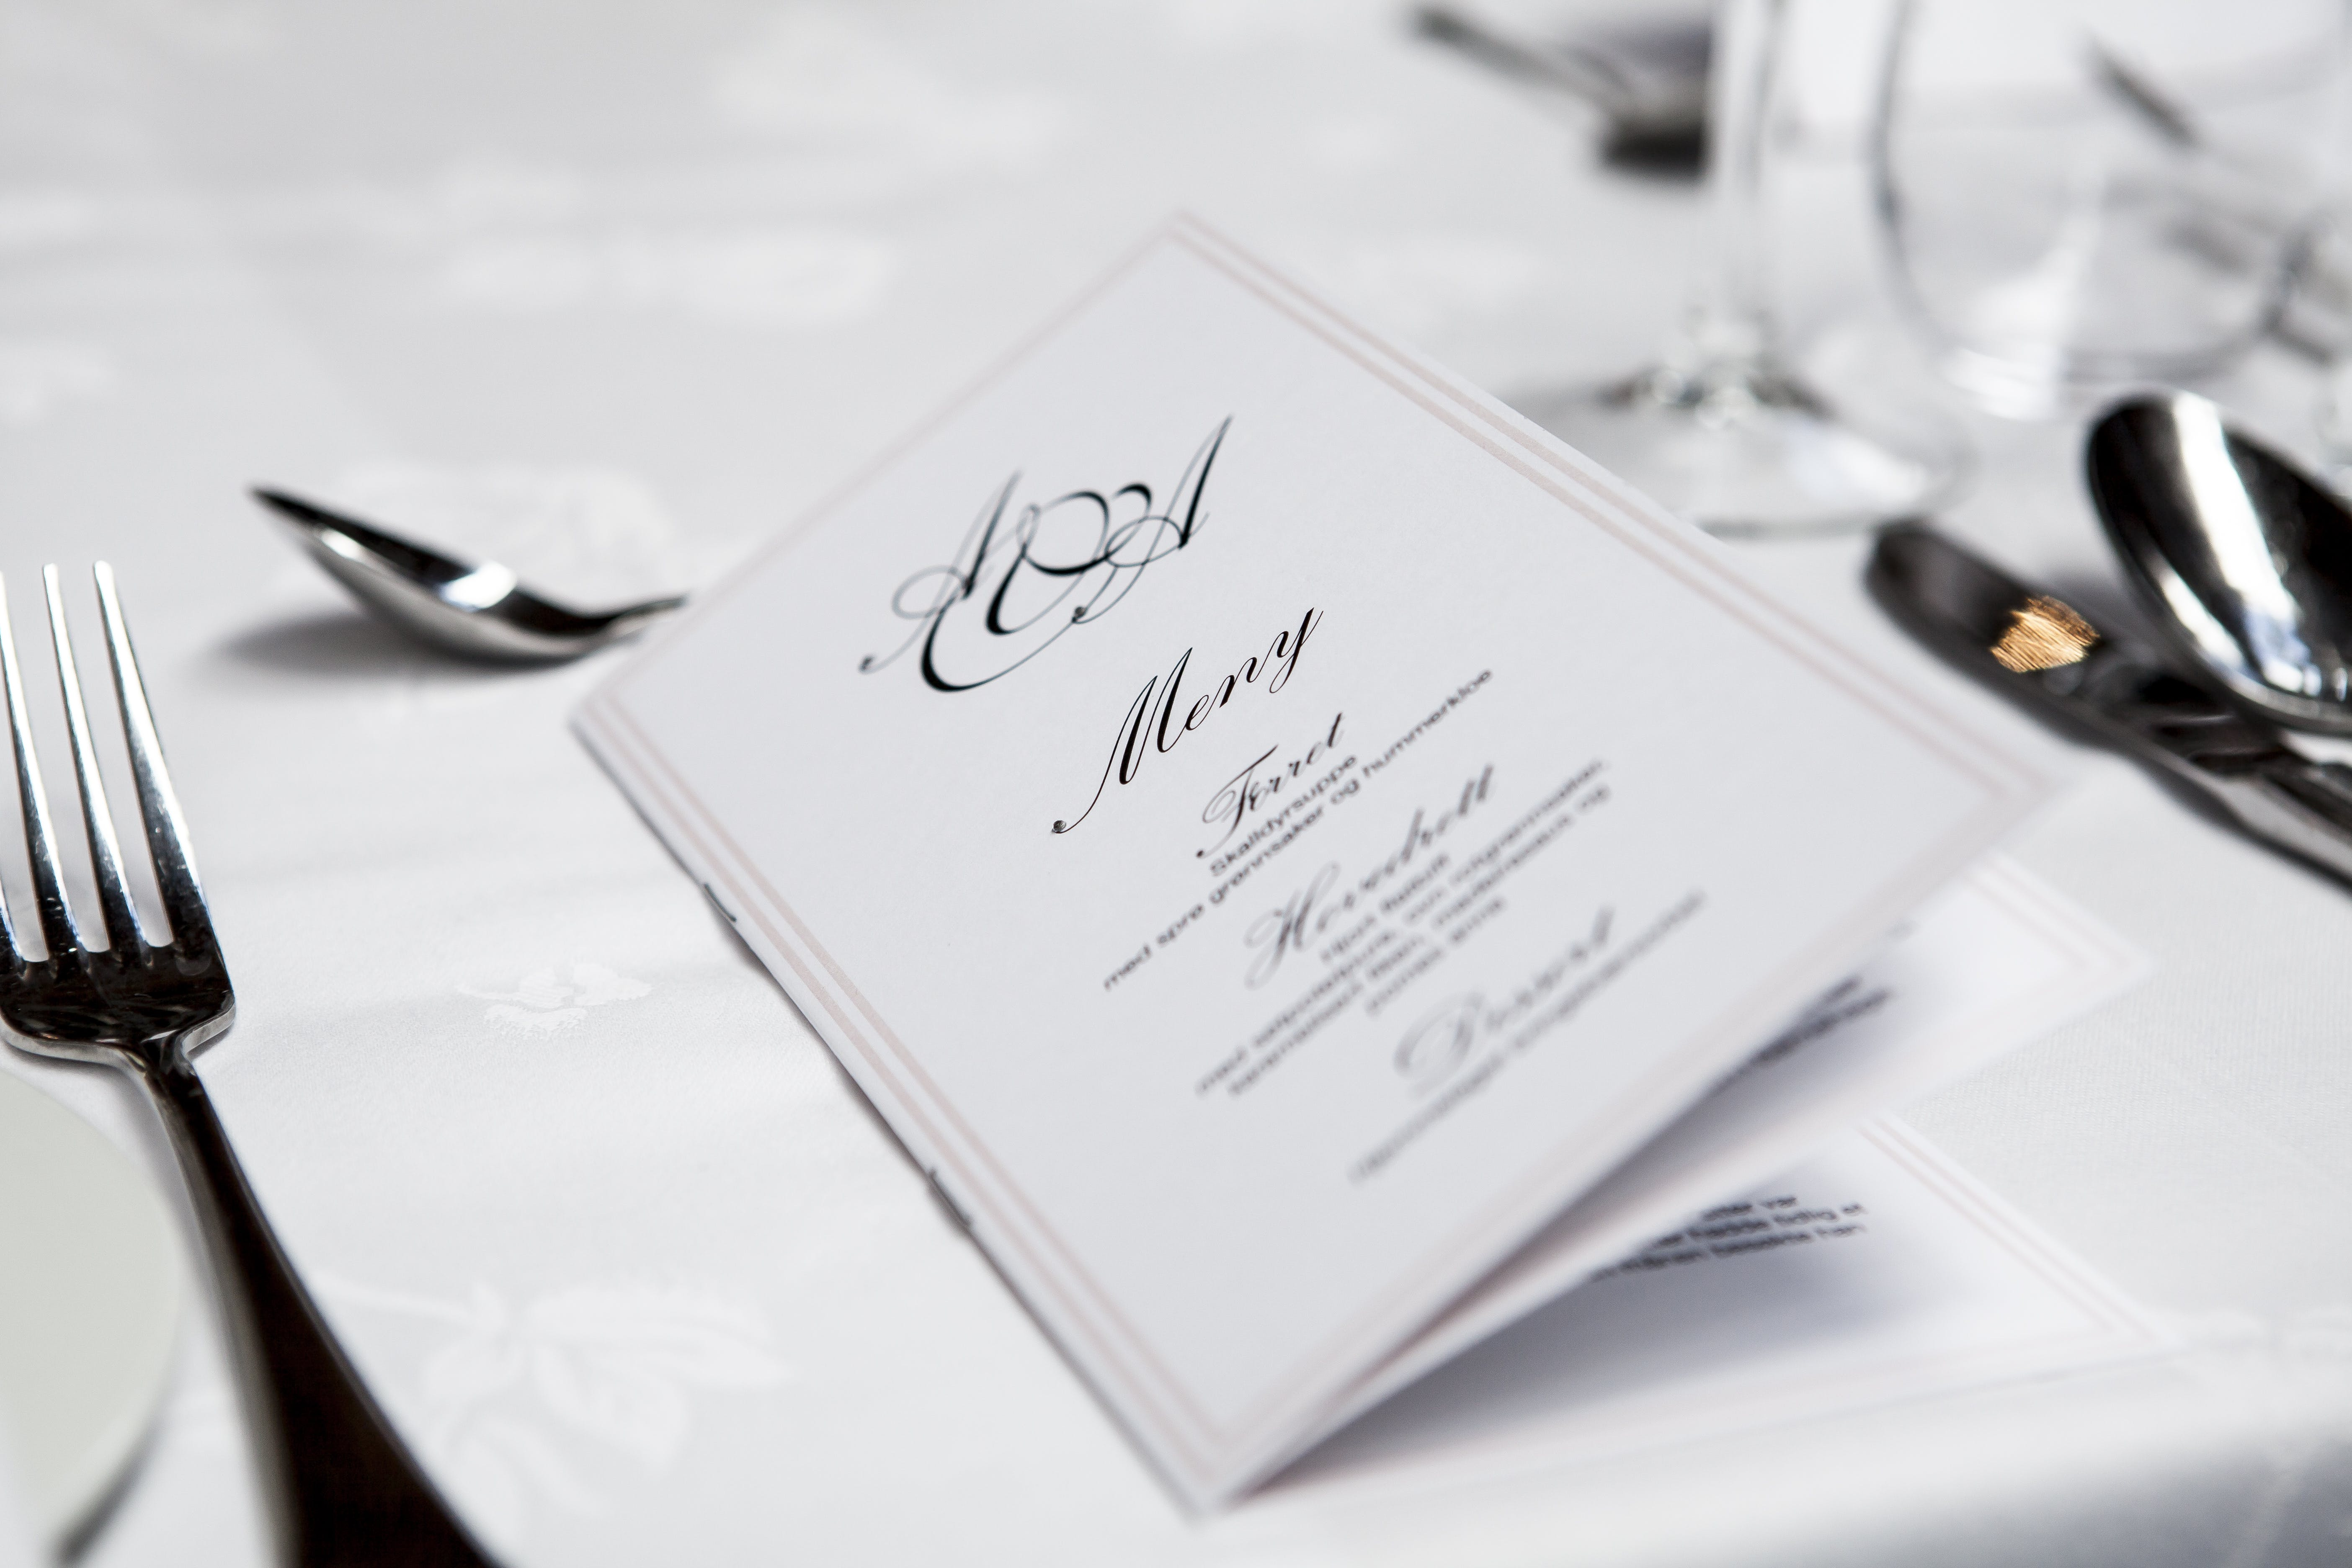 Картинки для ресторана меню, юбилеем мужчину открытки